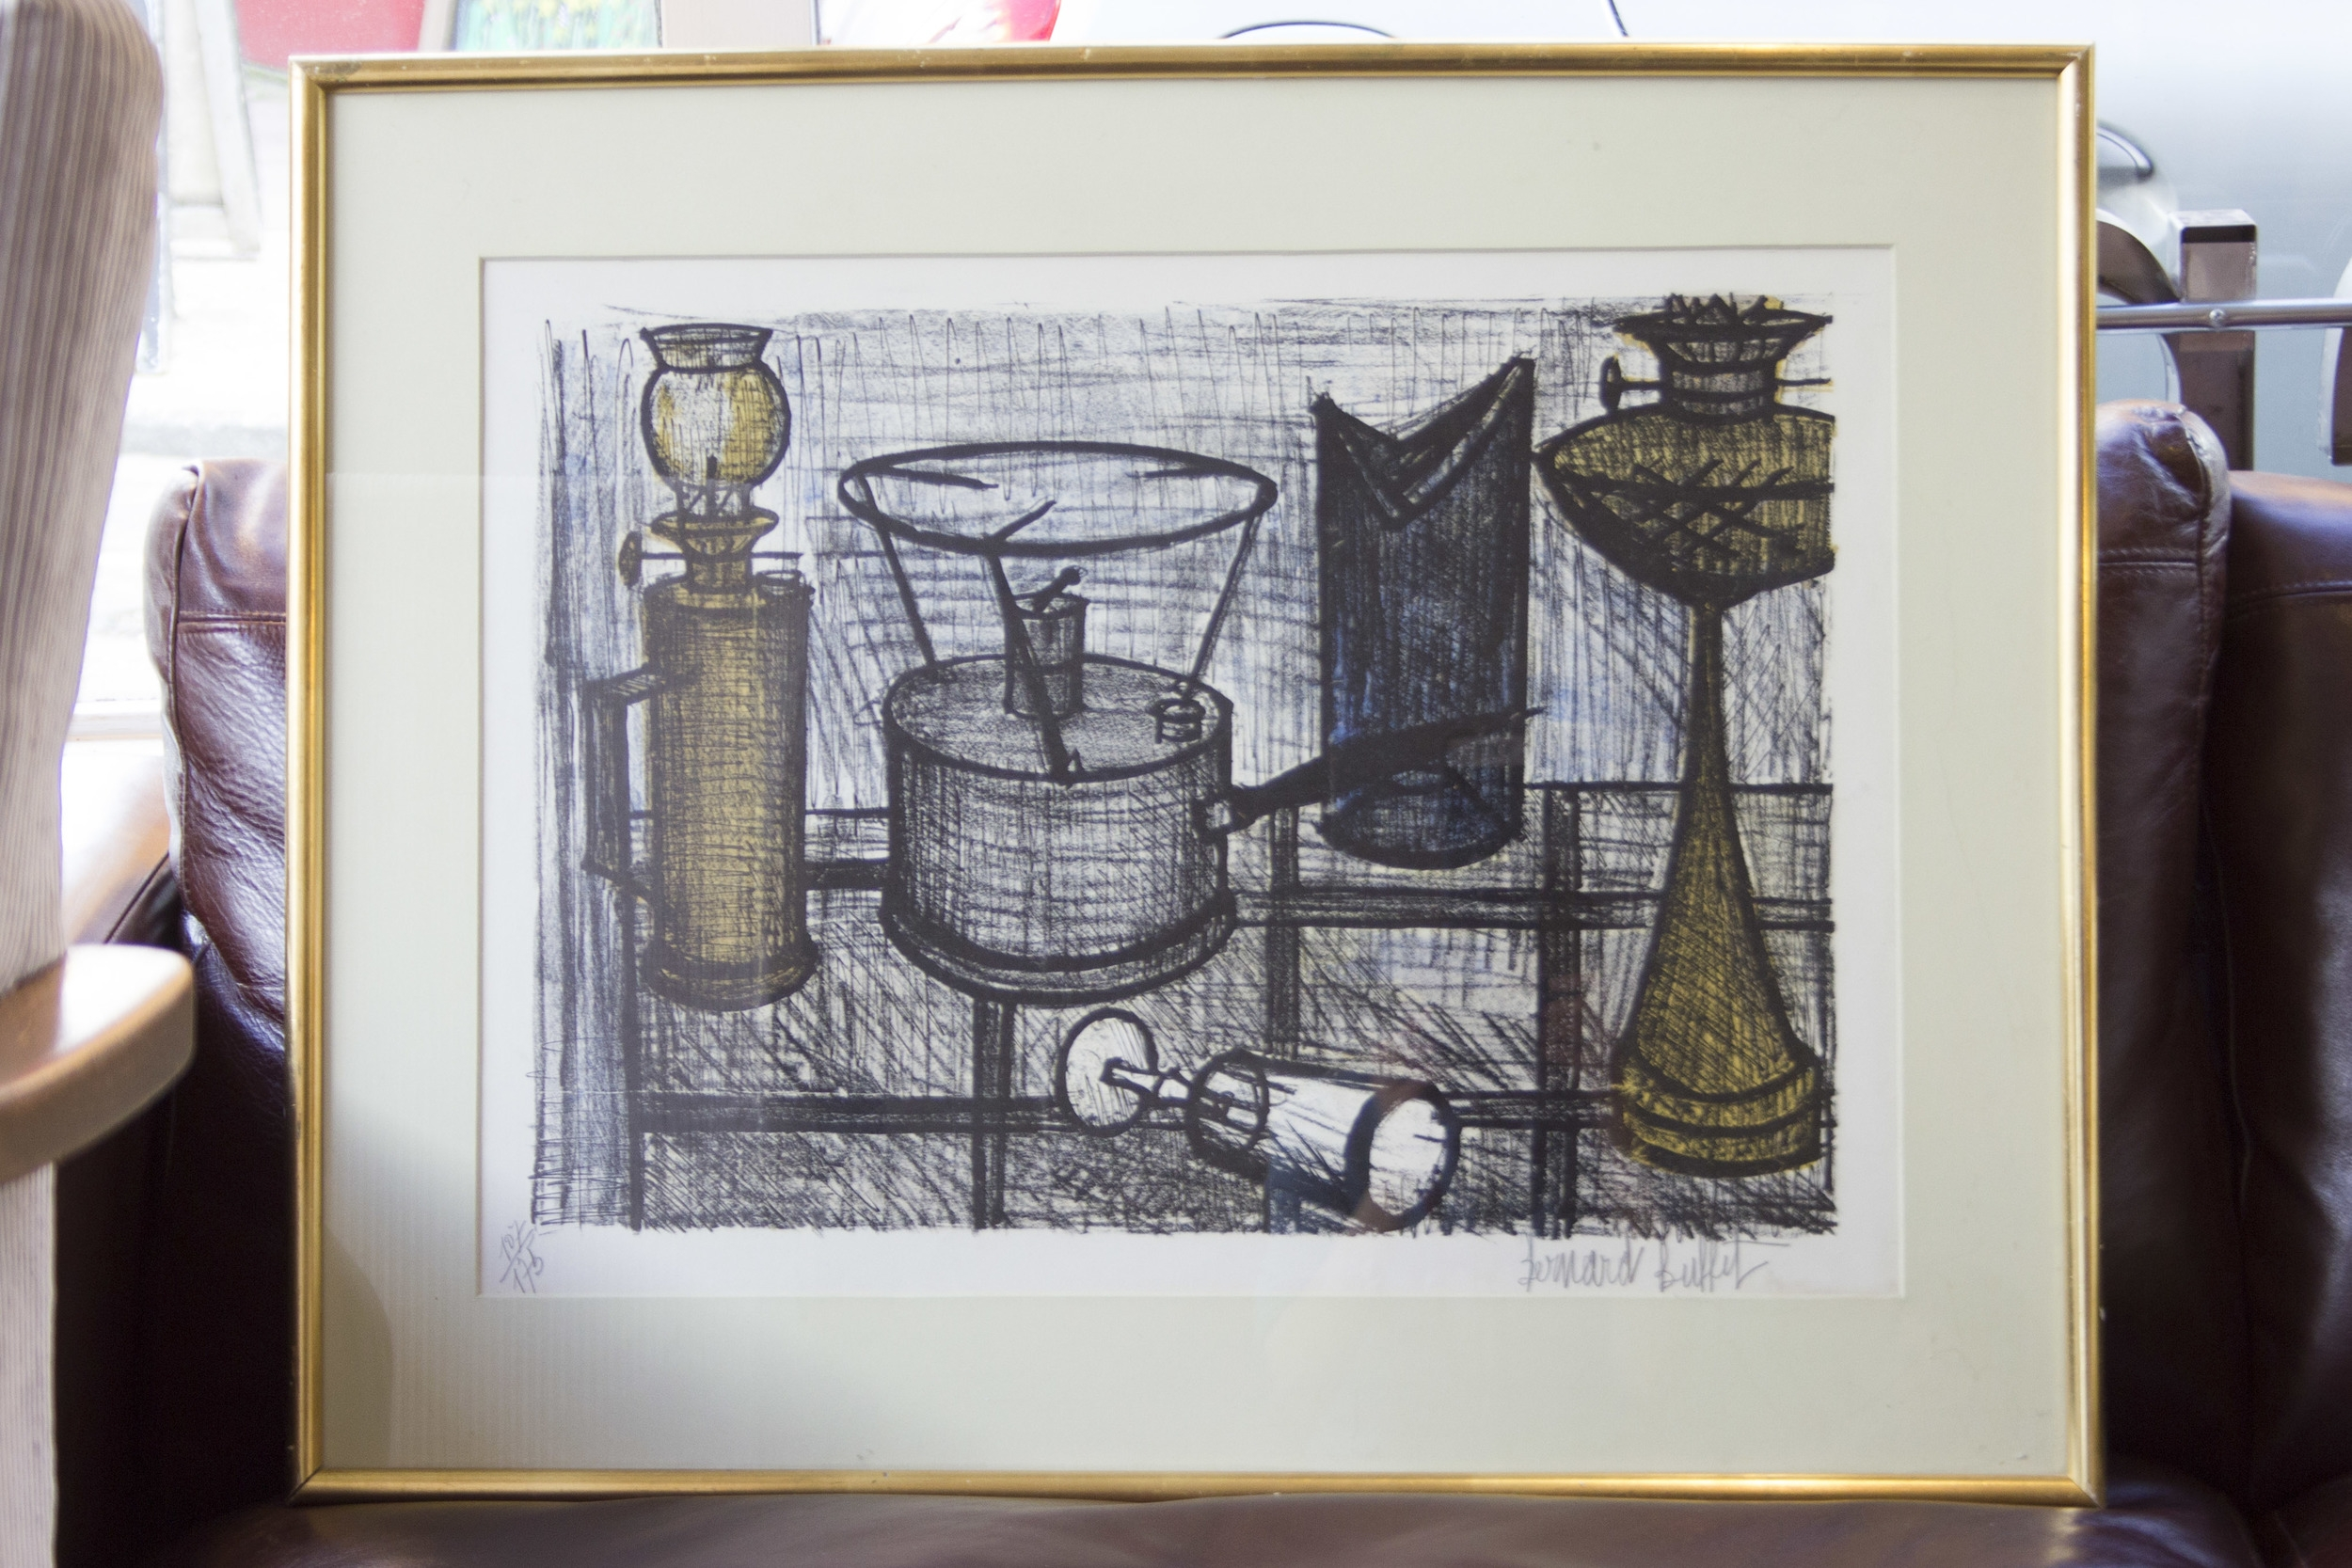 Bernard Buffet Limited Edition Print, signed by Artist £750